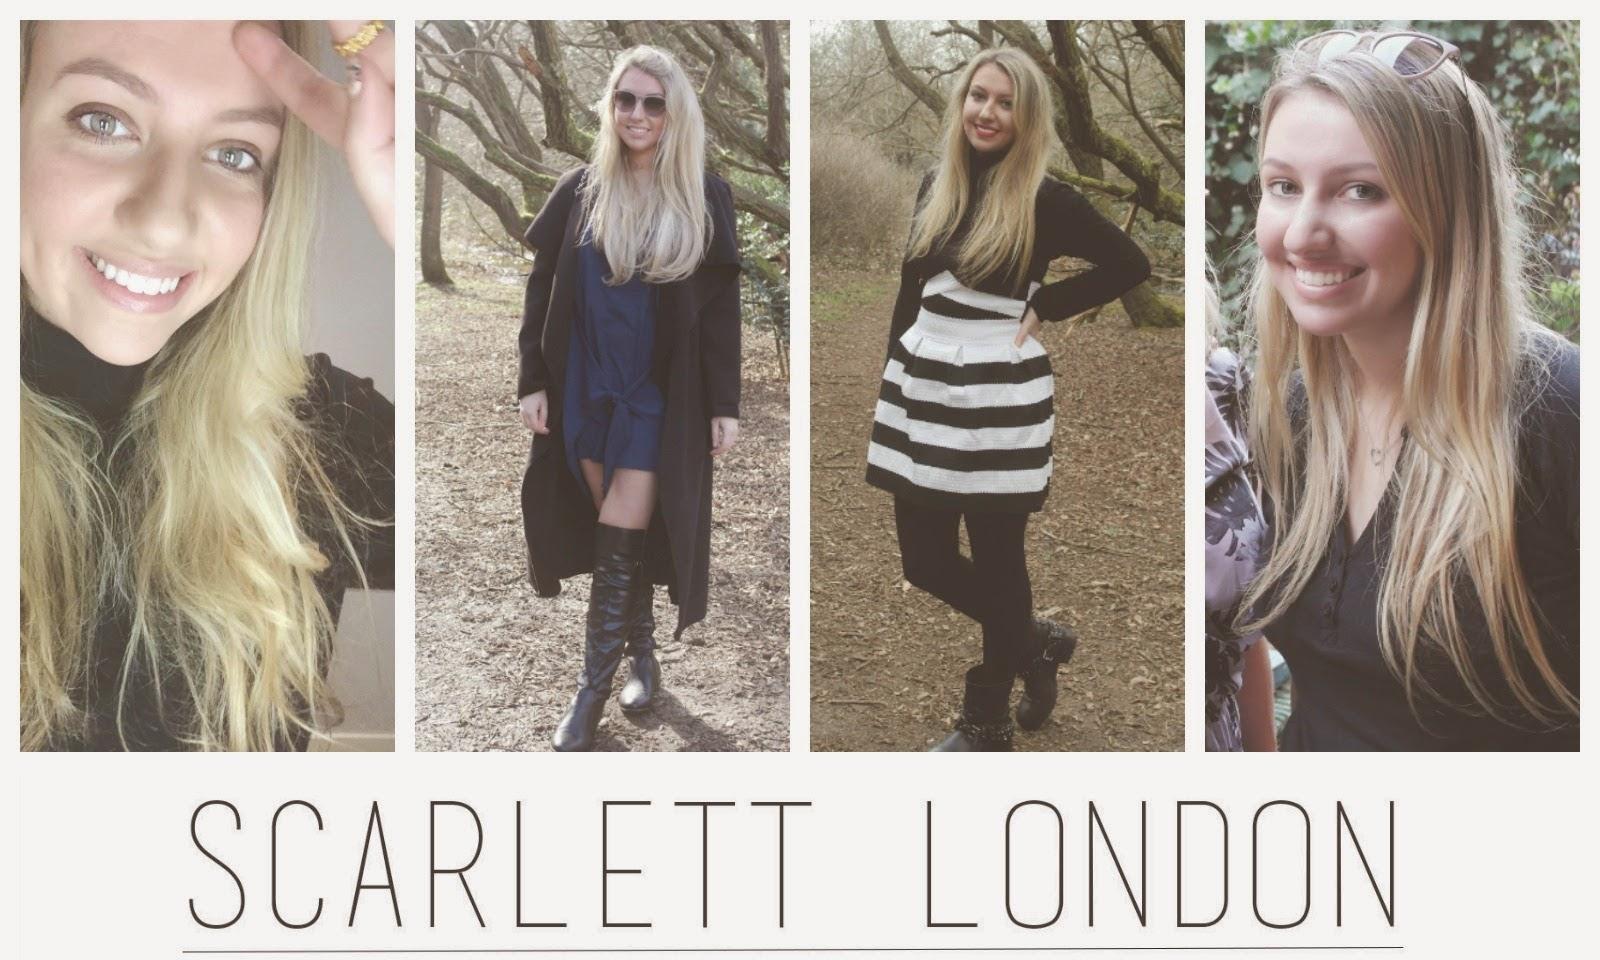 Clashing Time talks to Scarlett London